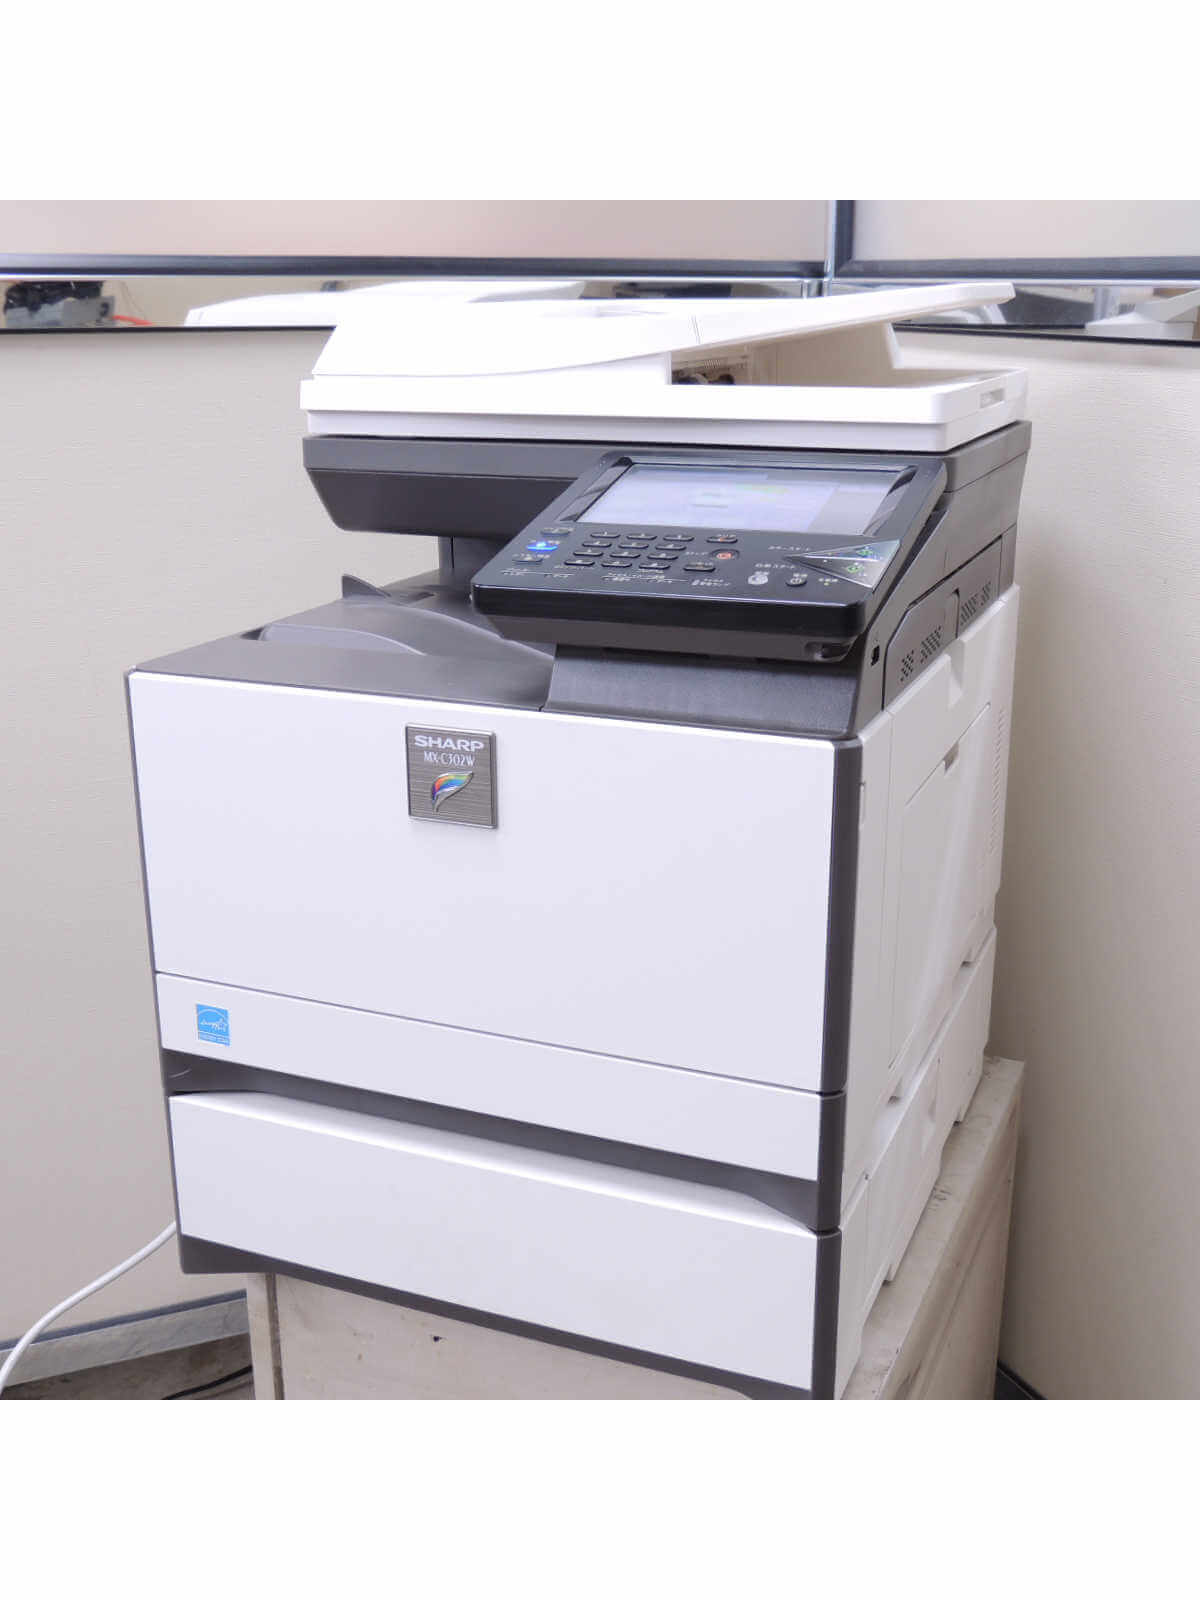 SHARP MX-C302W−中古カラー複合機、A4卓上、Mac対応、2段給紙